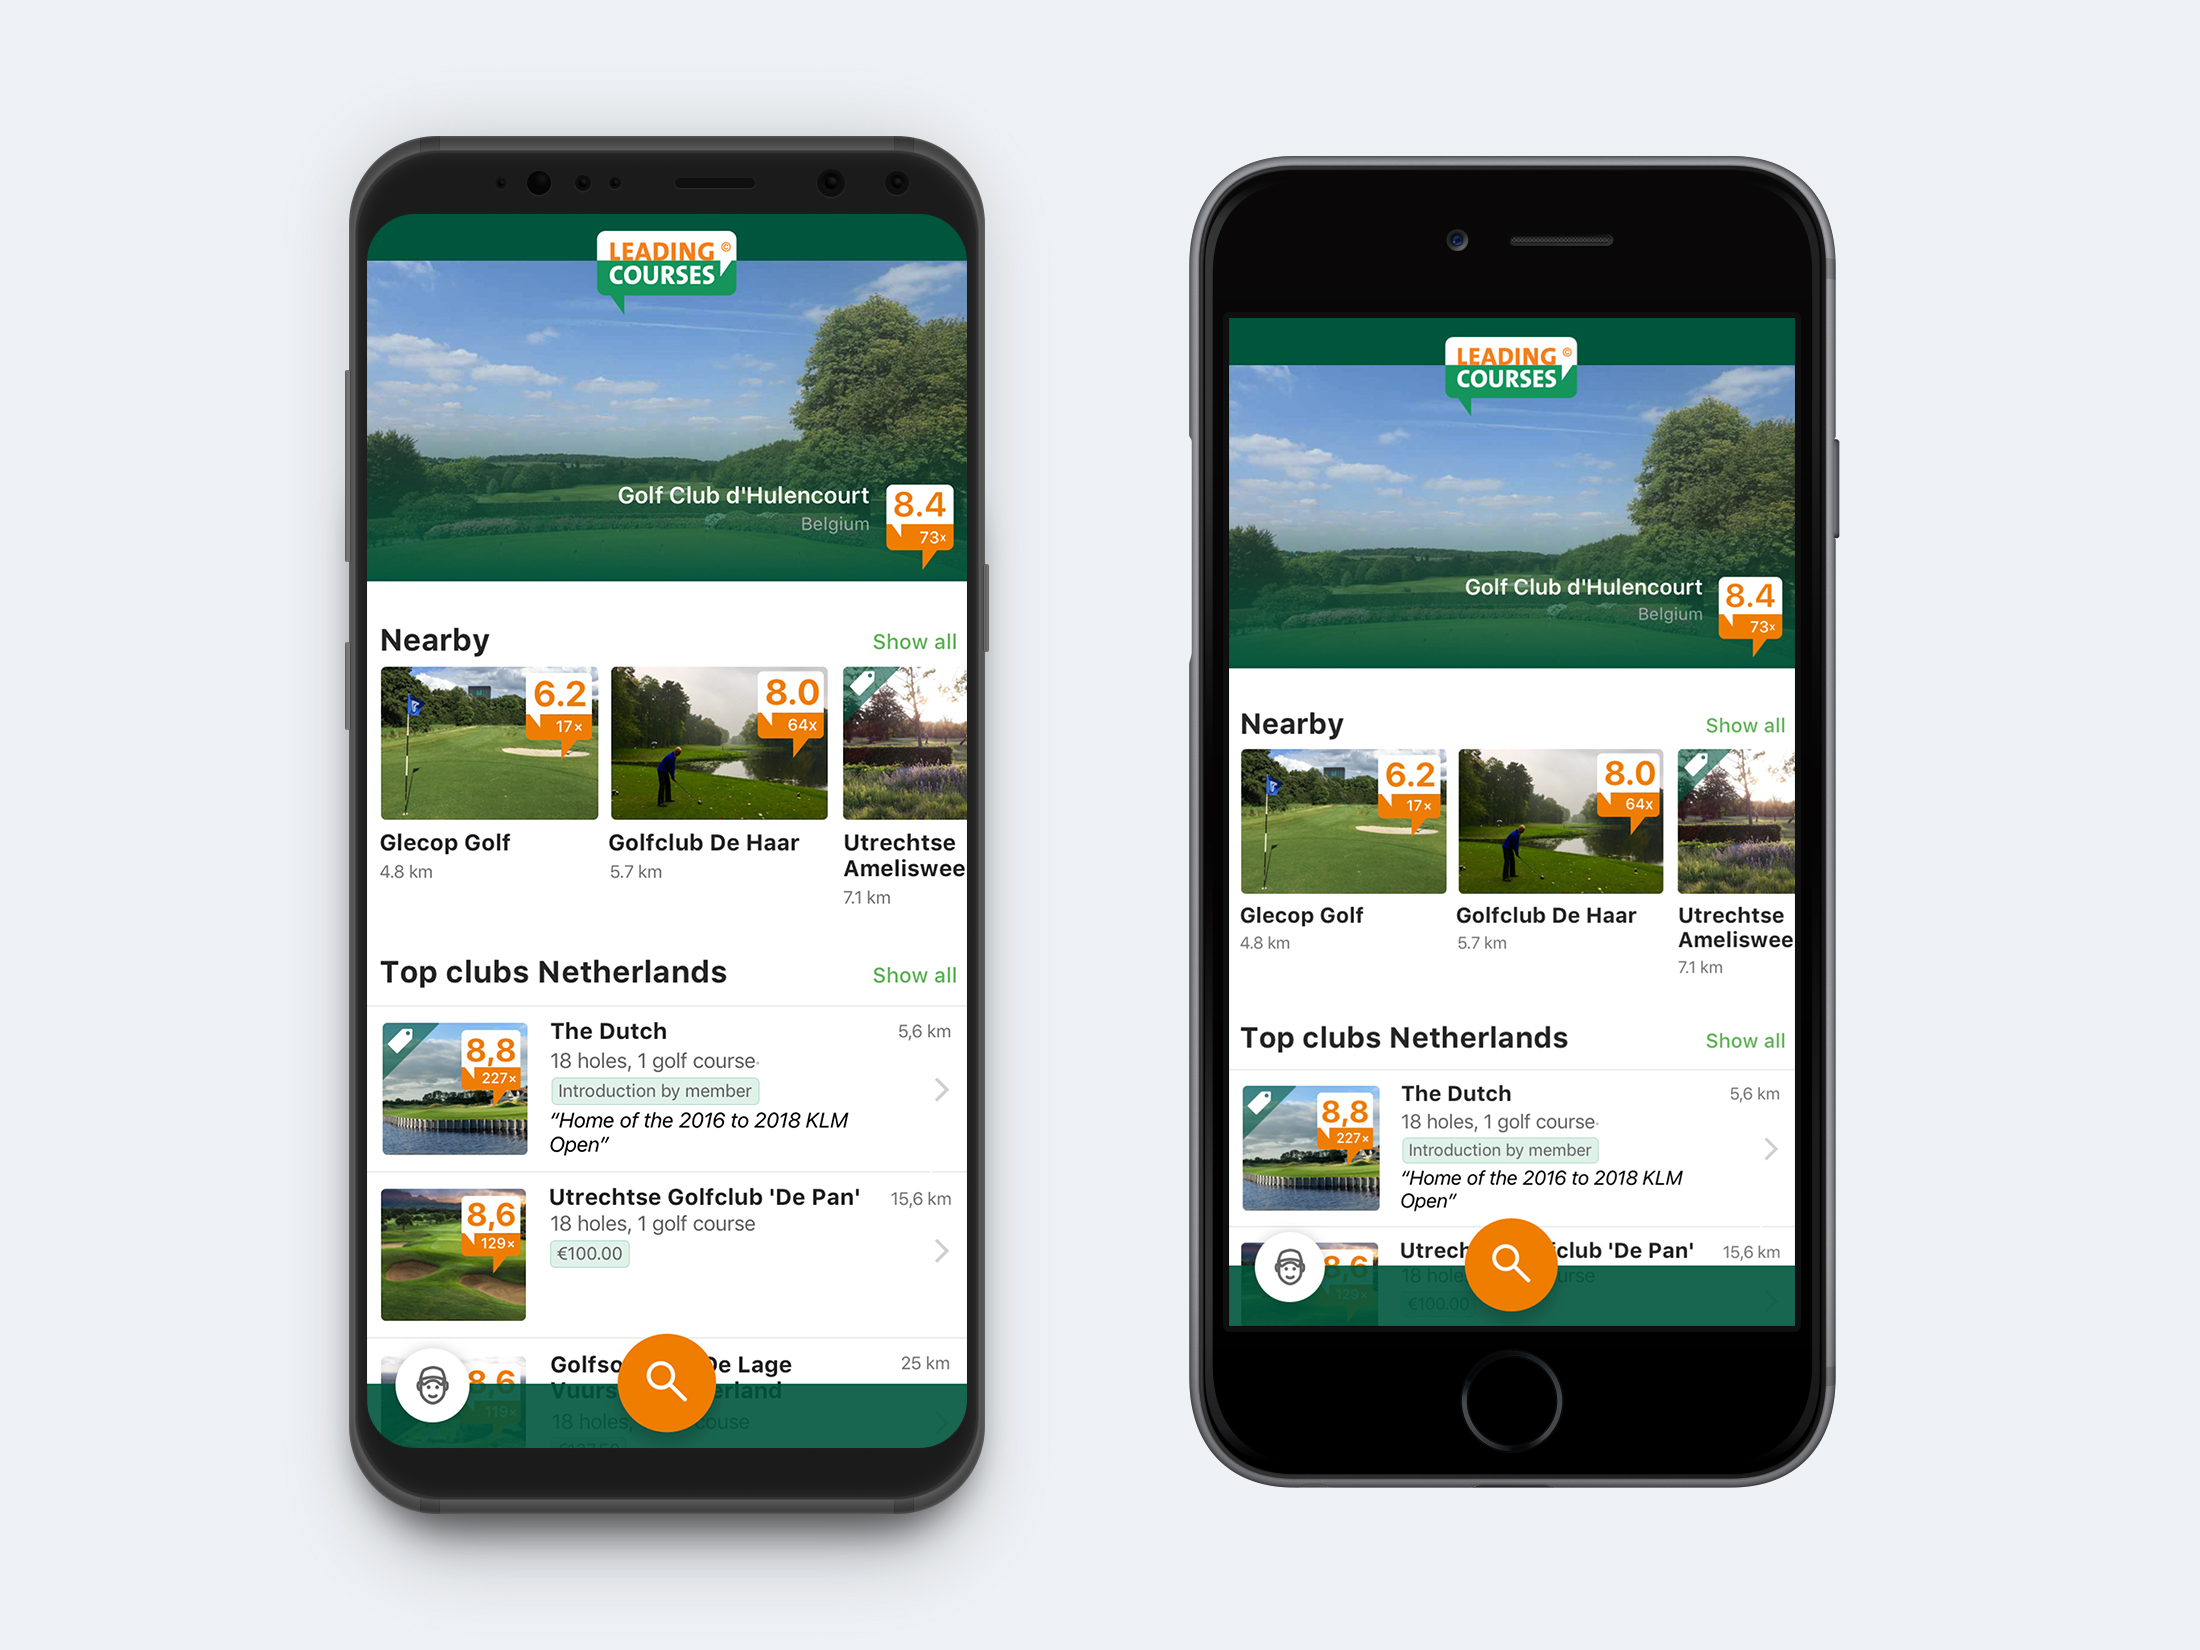 LeadingCourses.com Mobile App